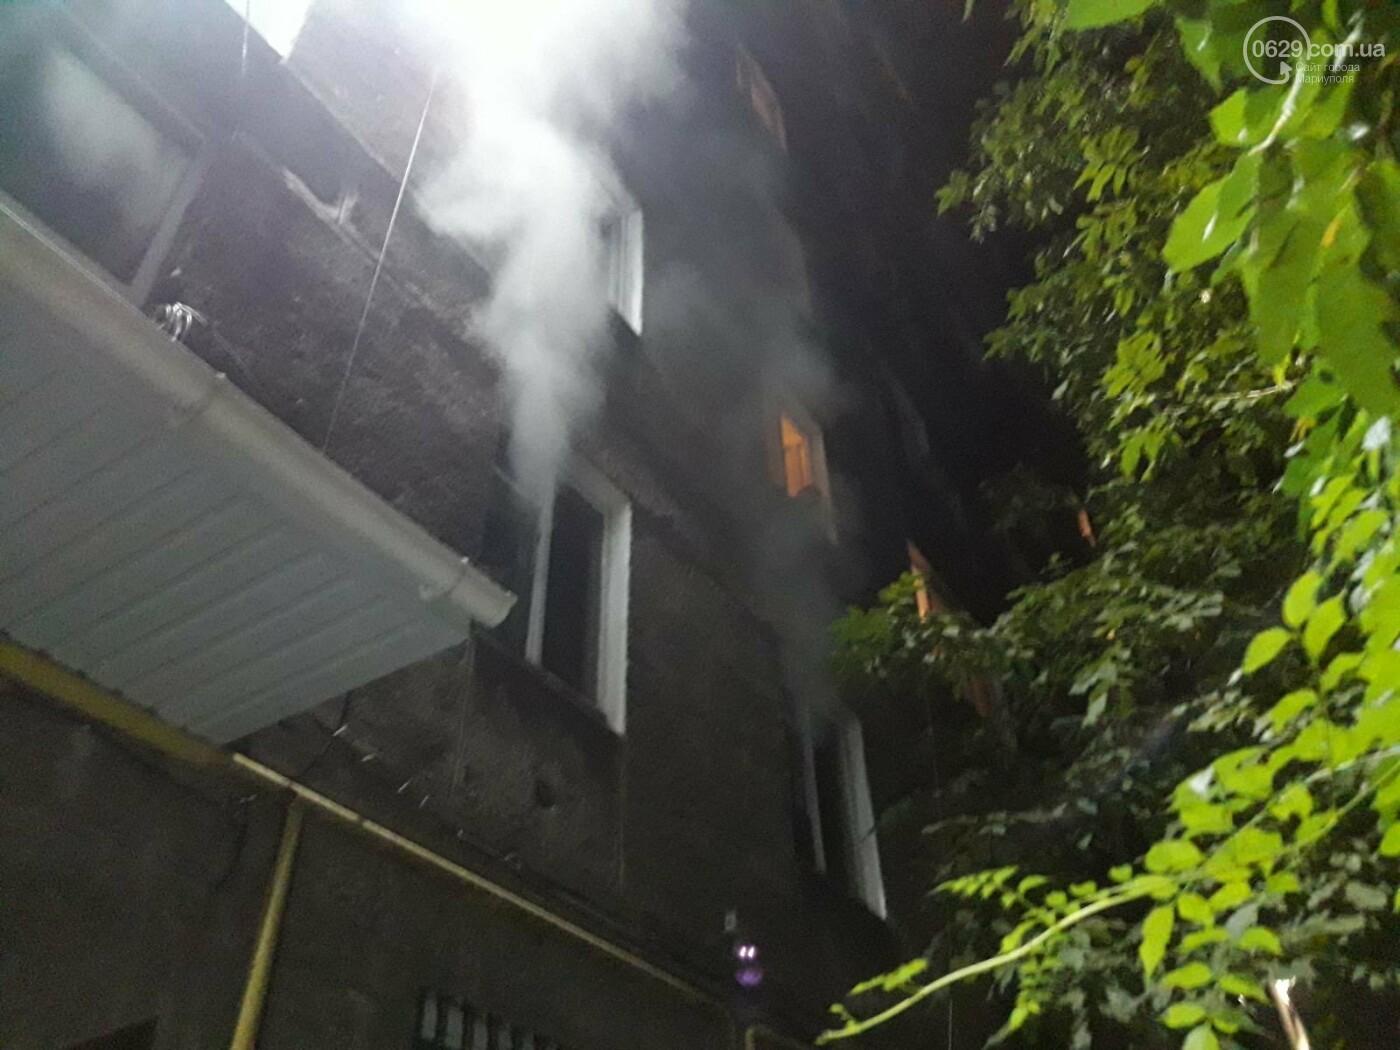 В Мариуполе при пожаре  в девятиэтажке пострадал мужчина, - ФОТО, фото-3